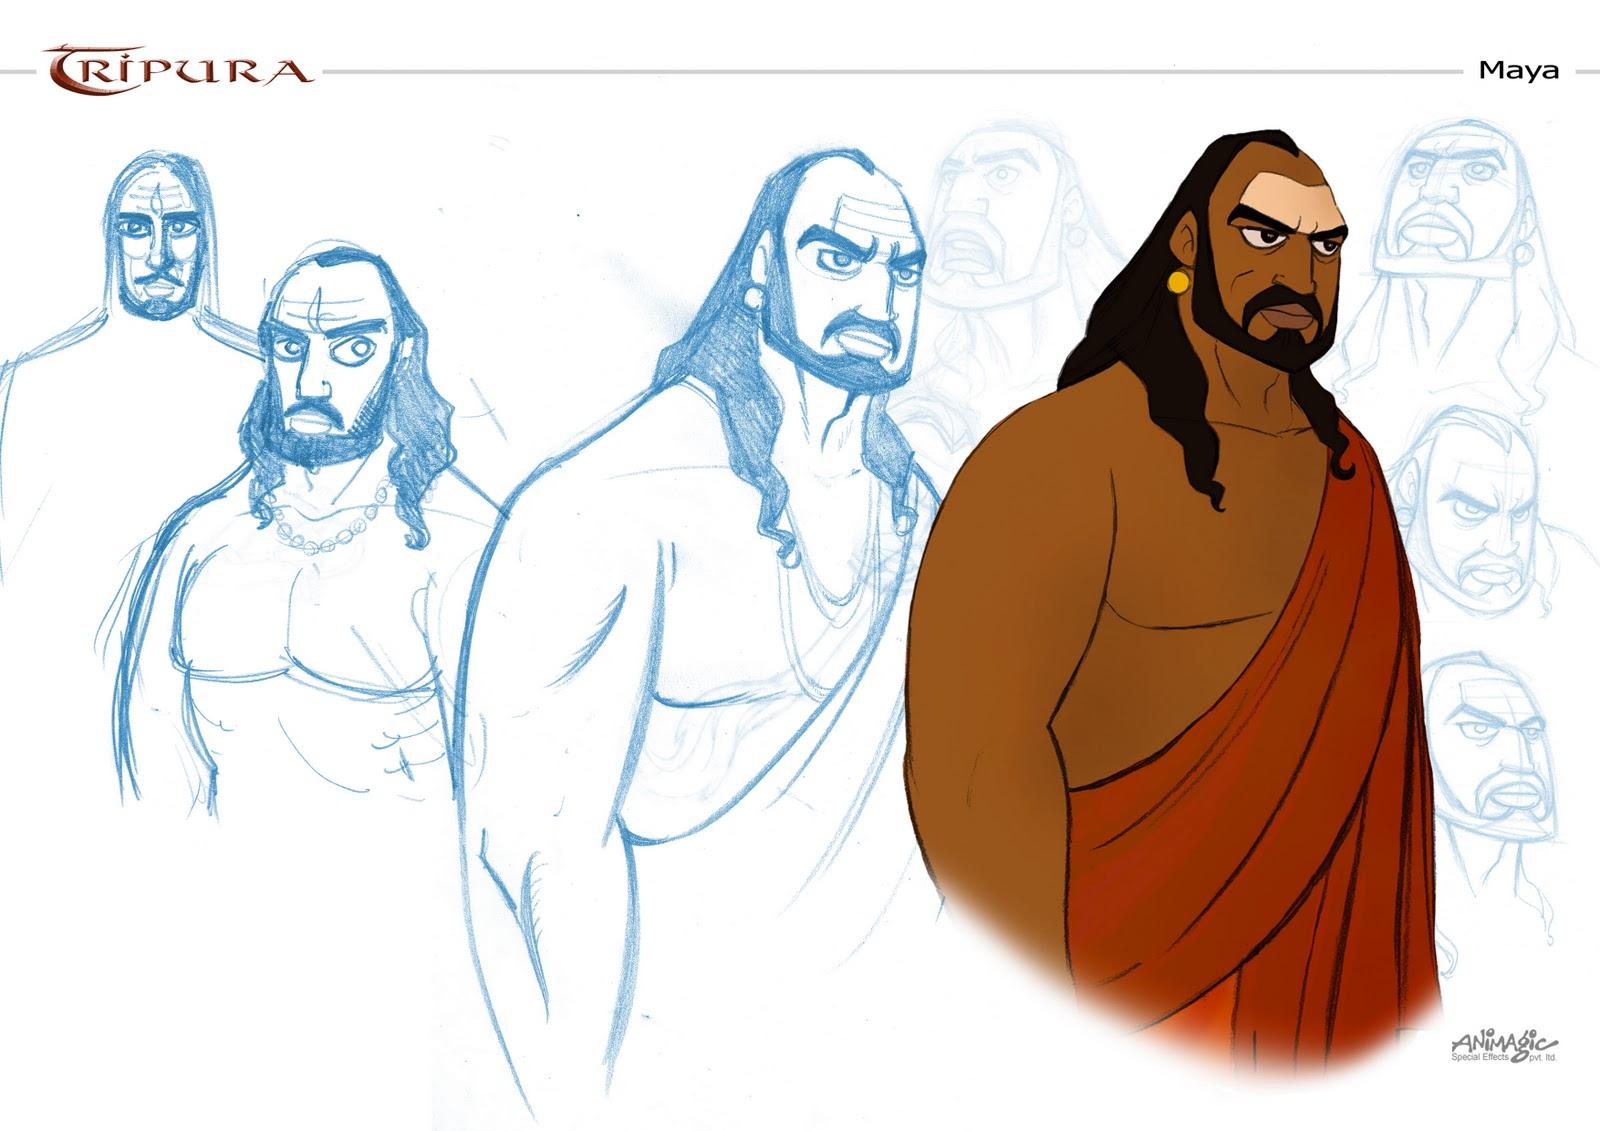 Character Design Maya : Chaitanya atman tripura character designs maya